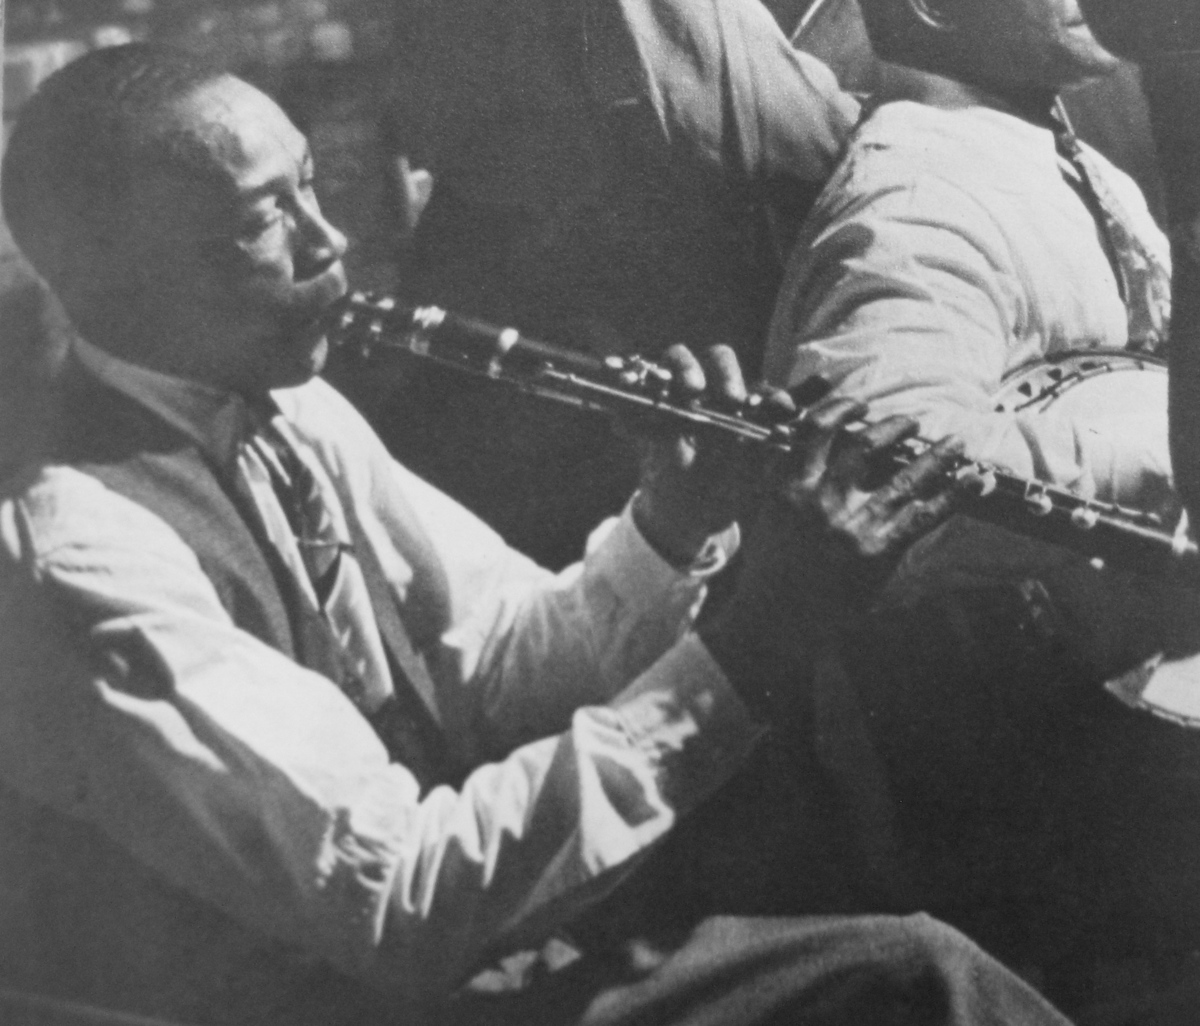 Standard george lewis clarinet fingers kubrick 1950